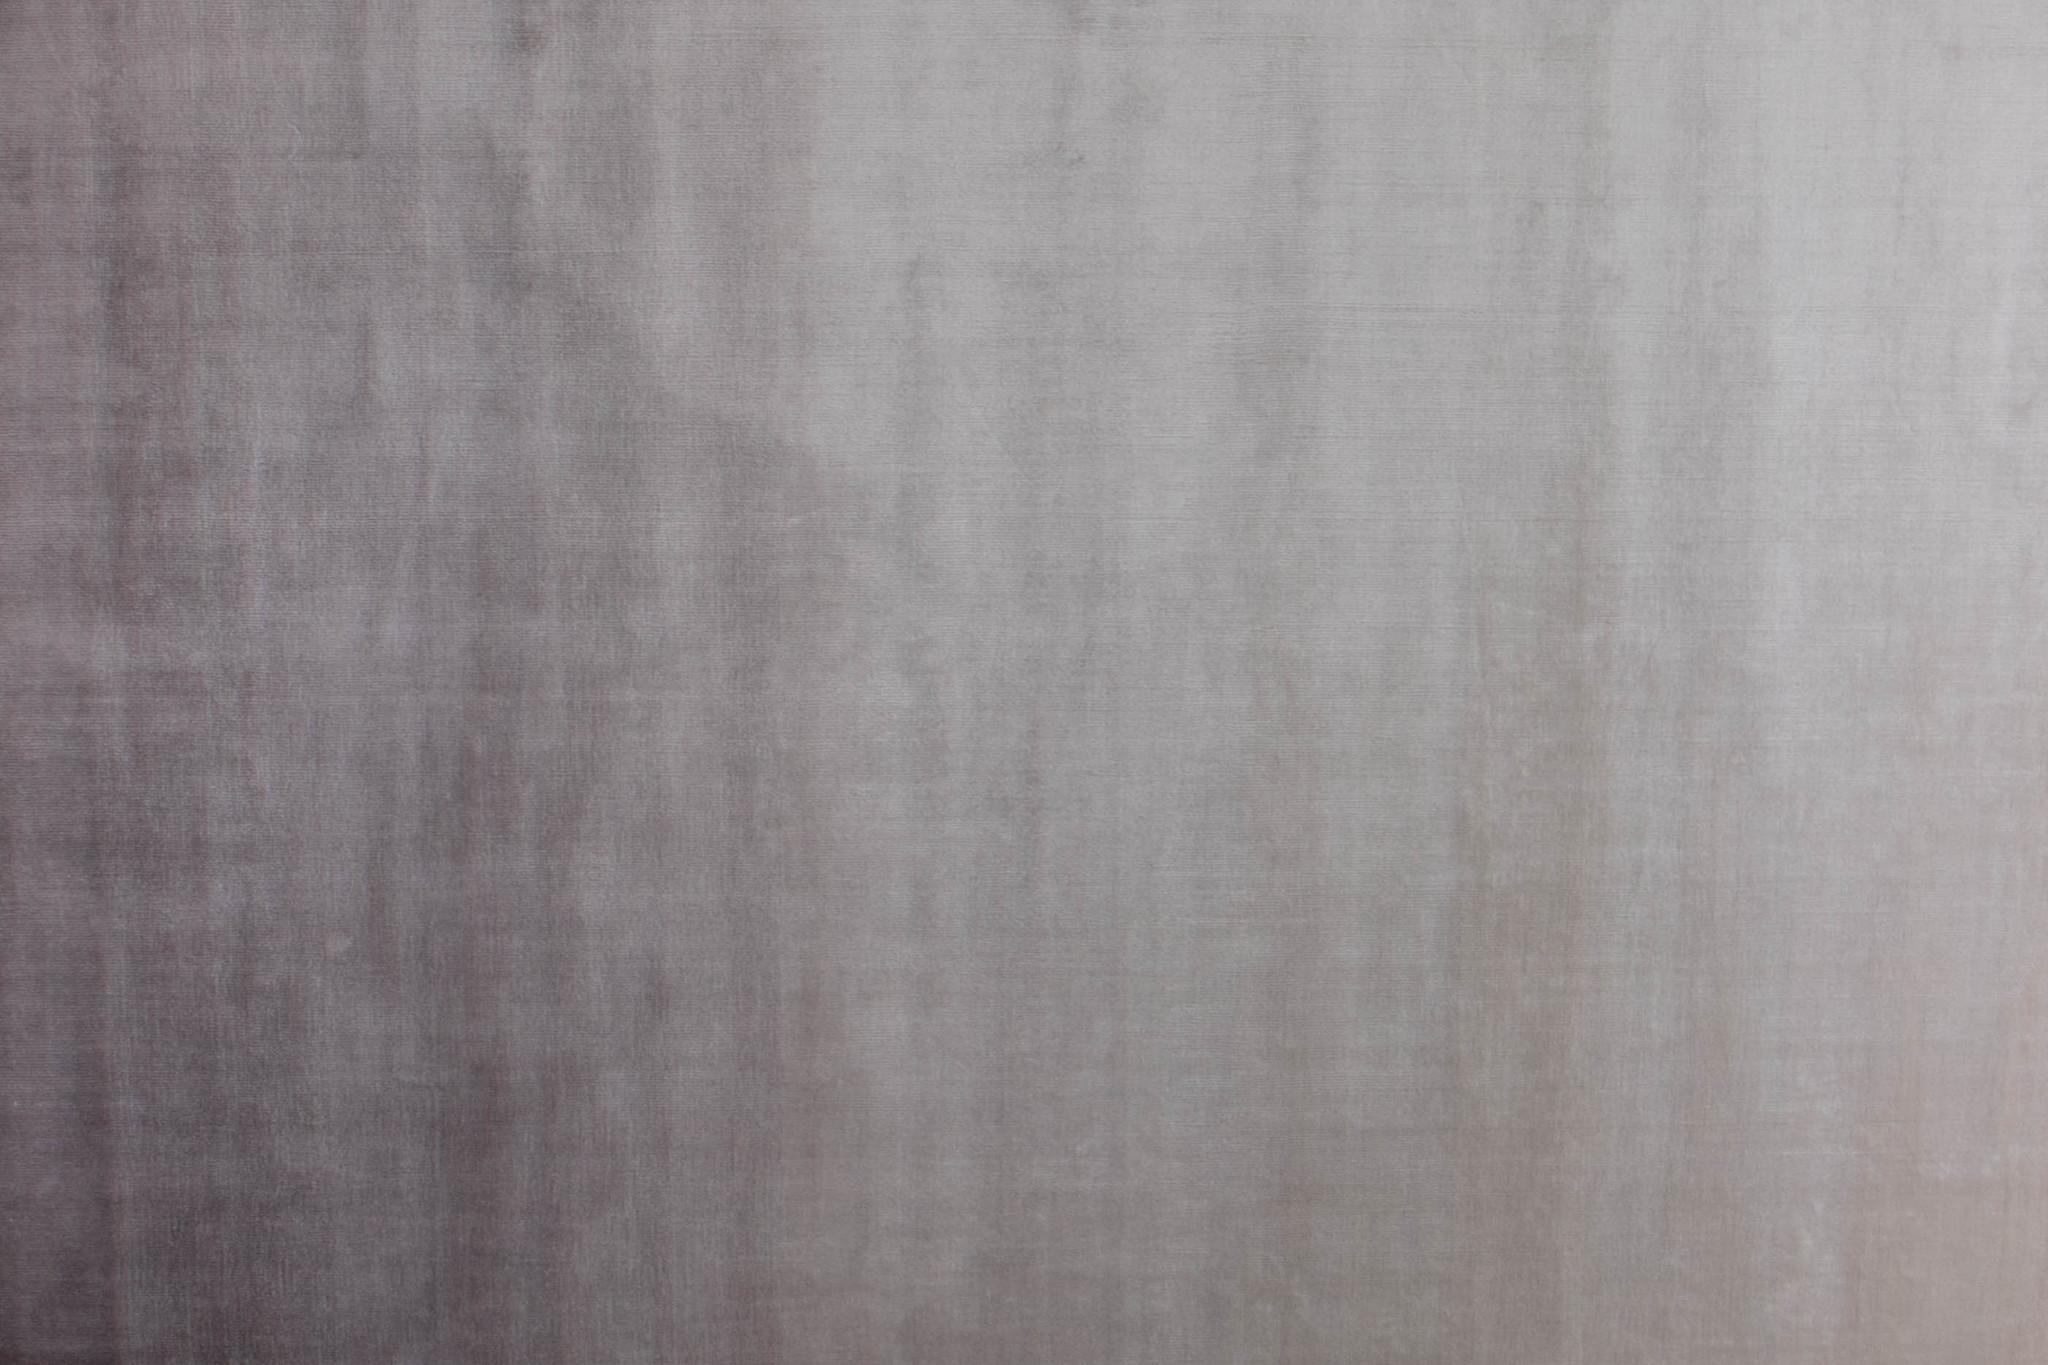 UMBRIA Carpet Champagne Fade 300x400-1